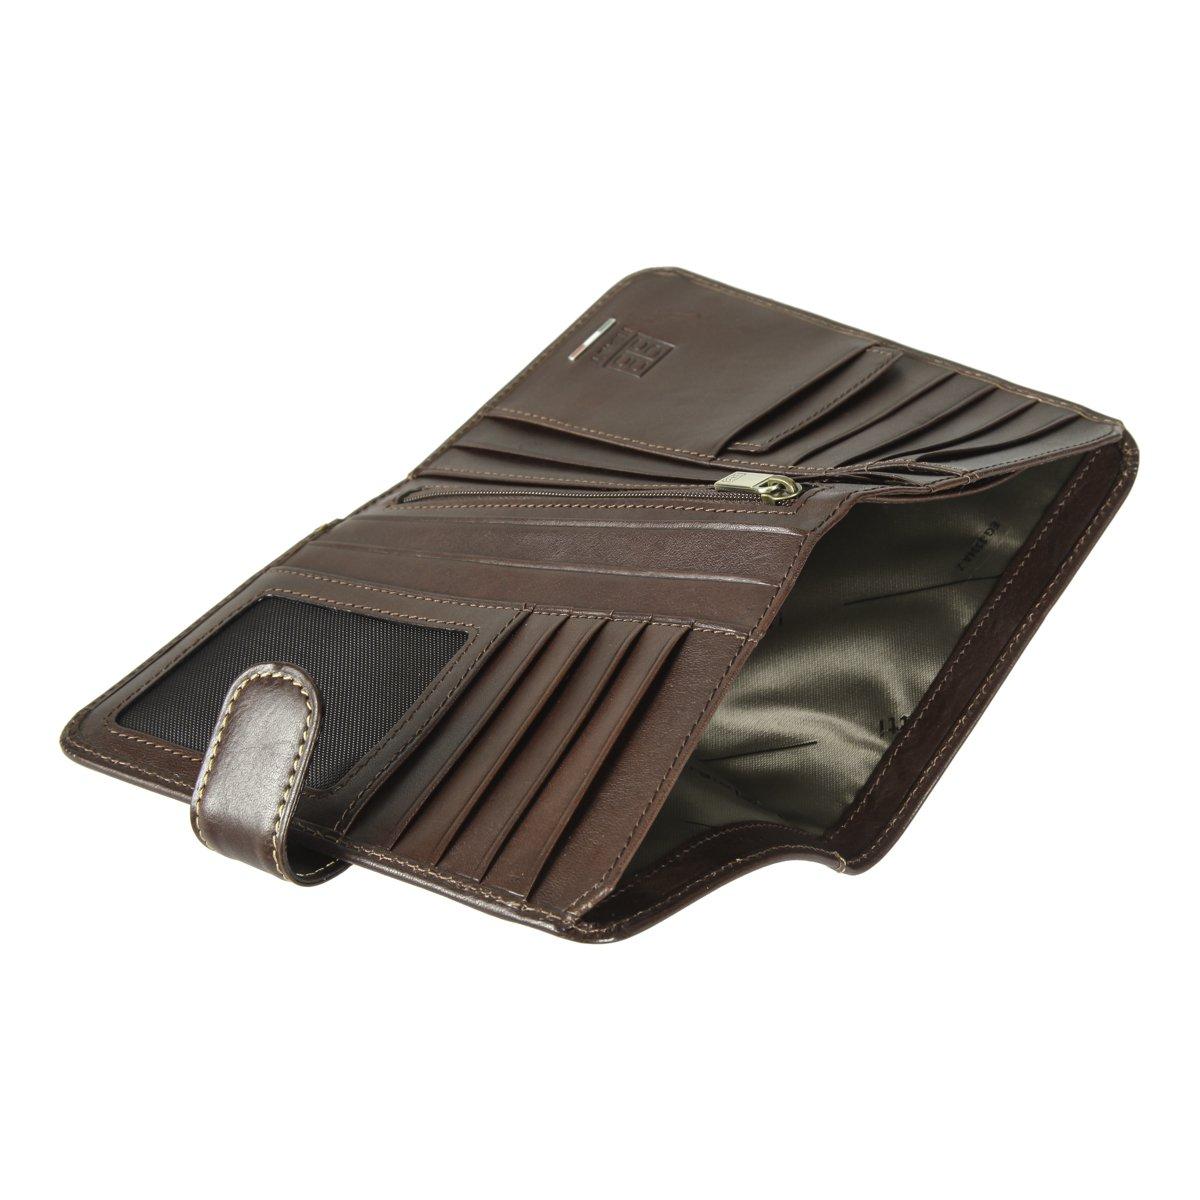 9d1057f10505 2334 ancona brown Портмоне с обложкой для паспорта Sergio Belotti — доп.  фото №5